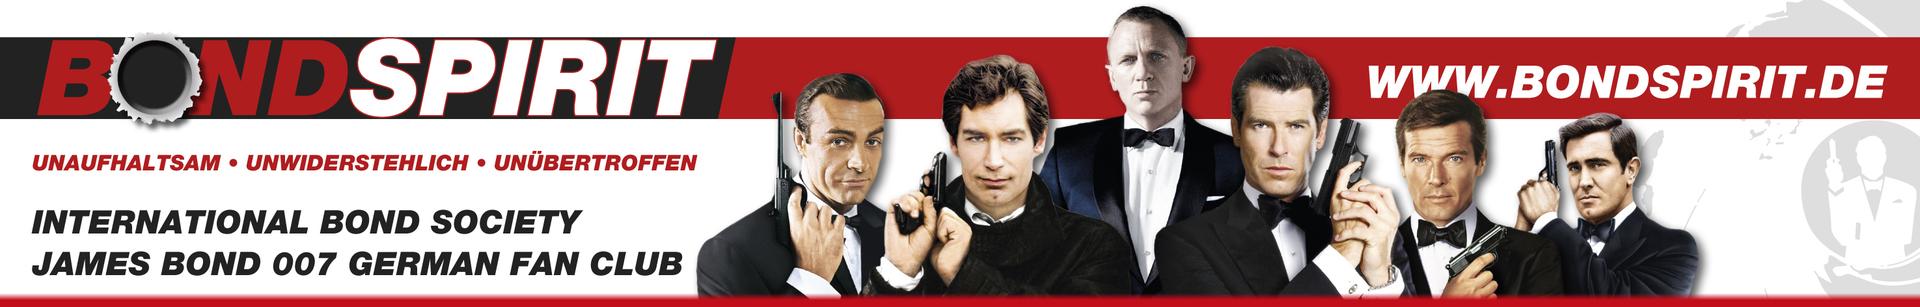 Bondspirit, James Bond 007 German Fan Club, International Bond Society